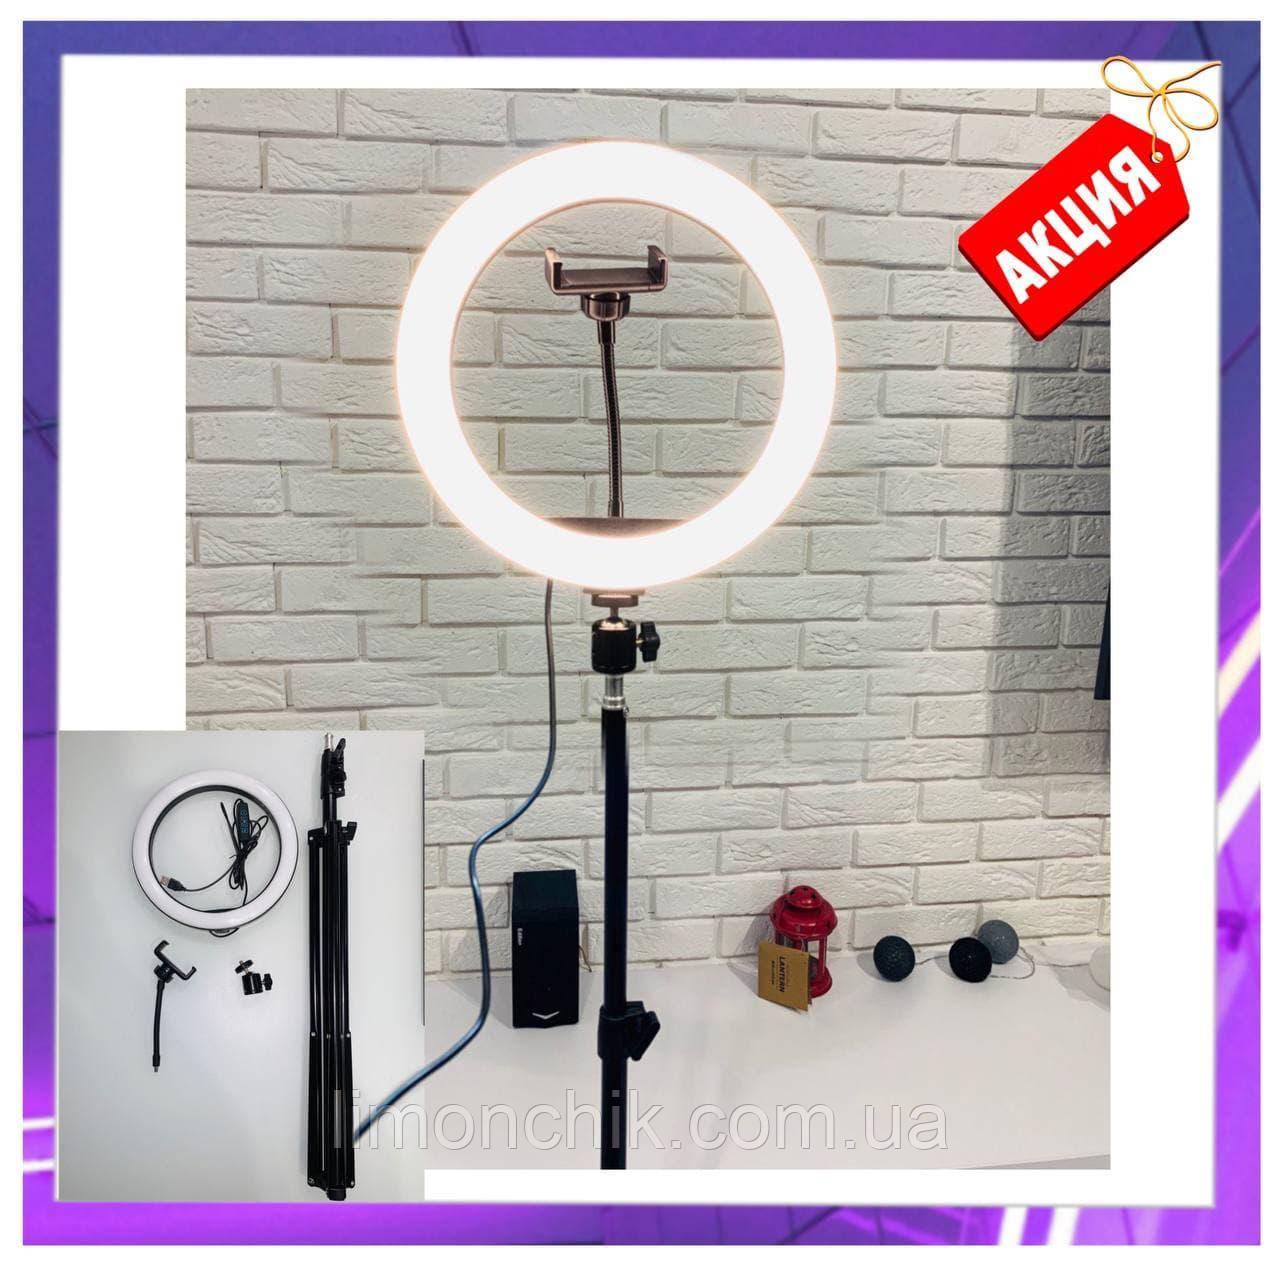 Кольцевая  лампа 33 см на штативе 2.1м, лампа блогера, фотографа, светодиодная лед лампа